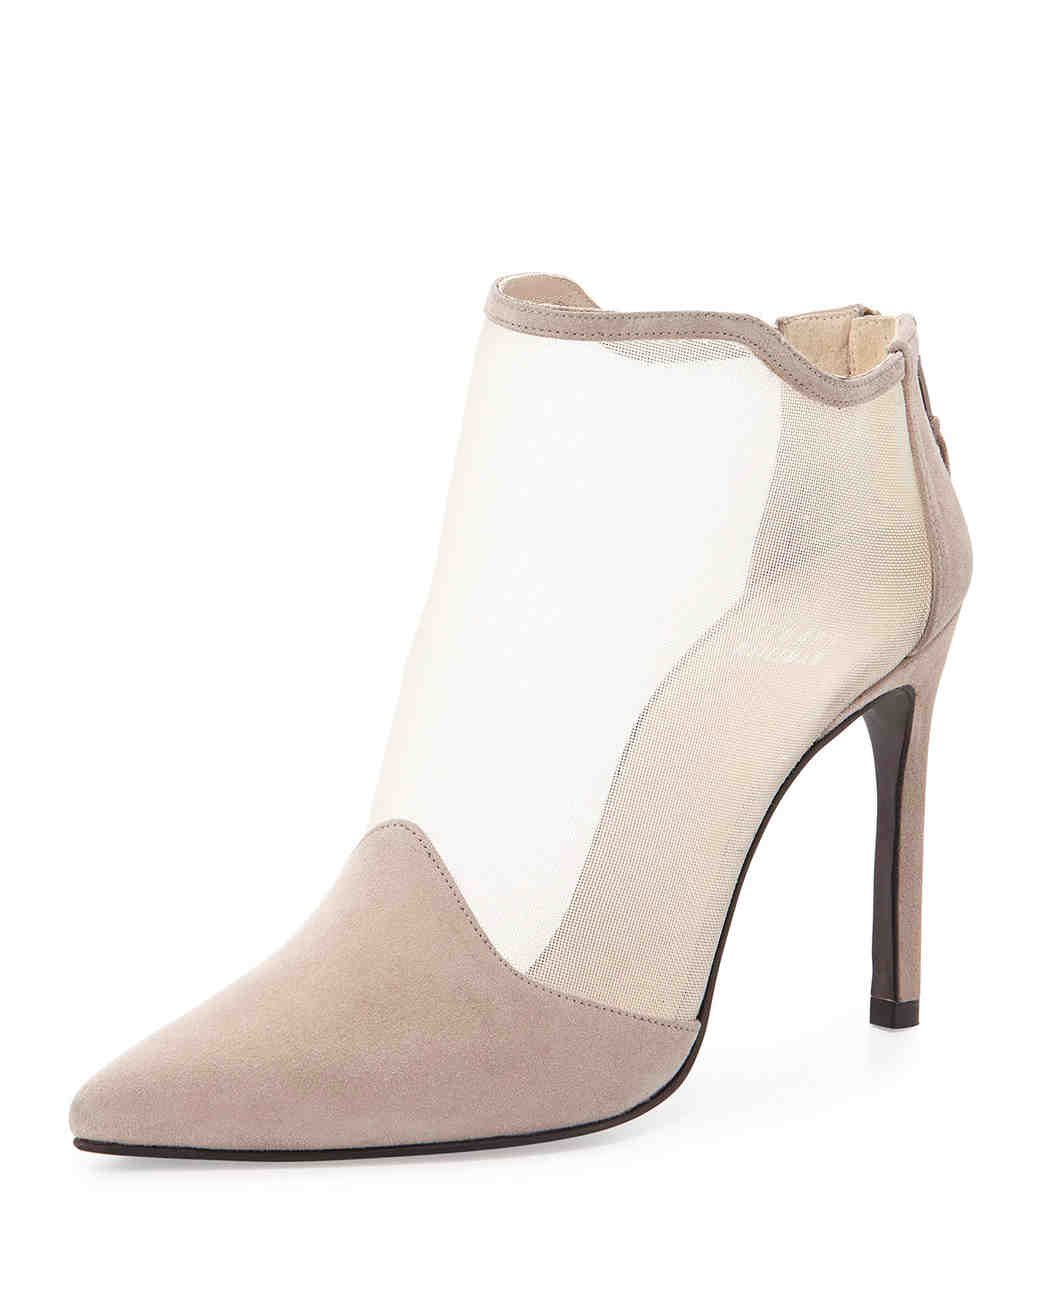 closed-toe-wedding-shoes-stuart-weitzman-neiman-marcus-1215.jpg